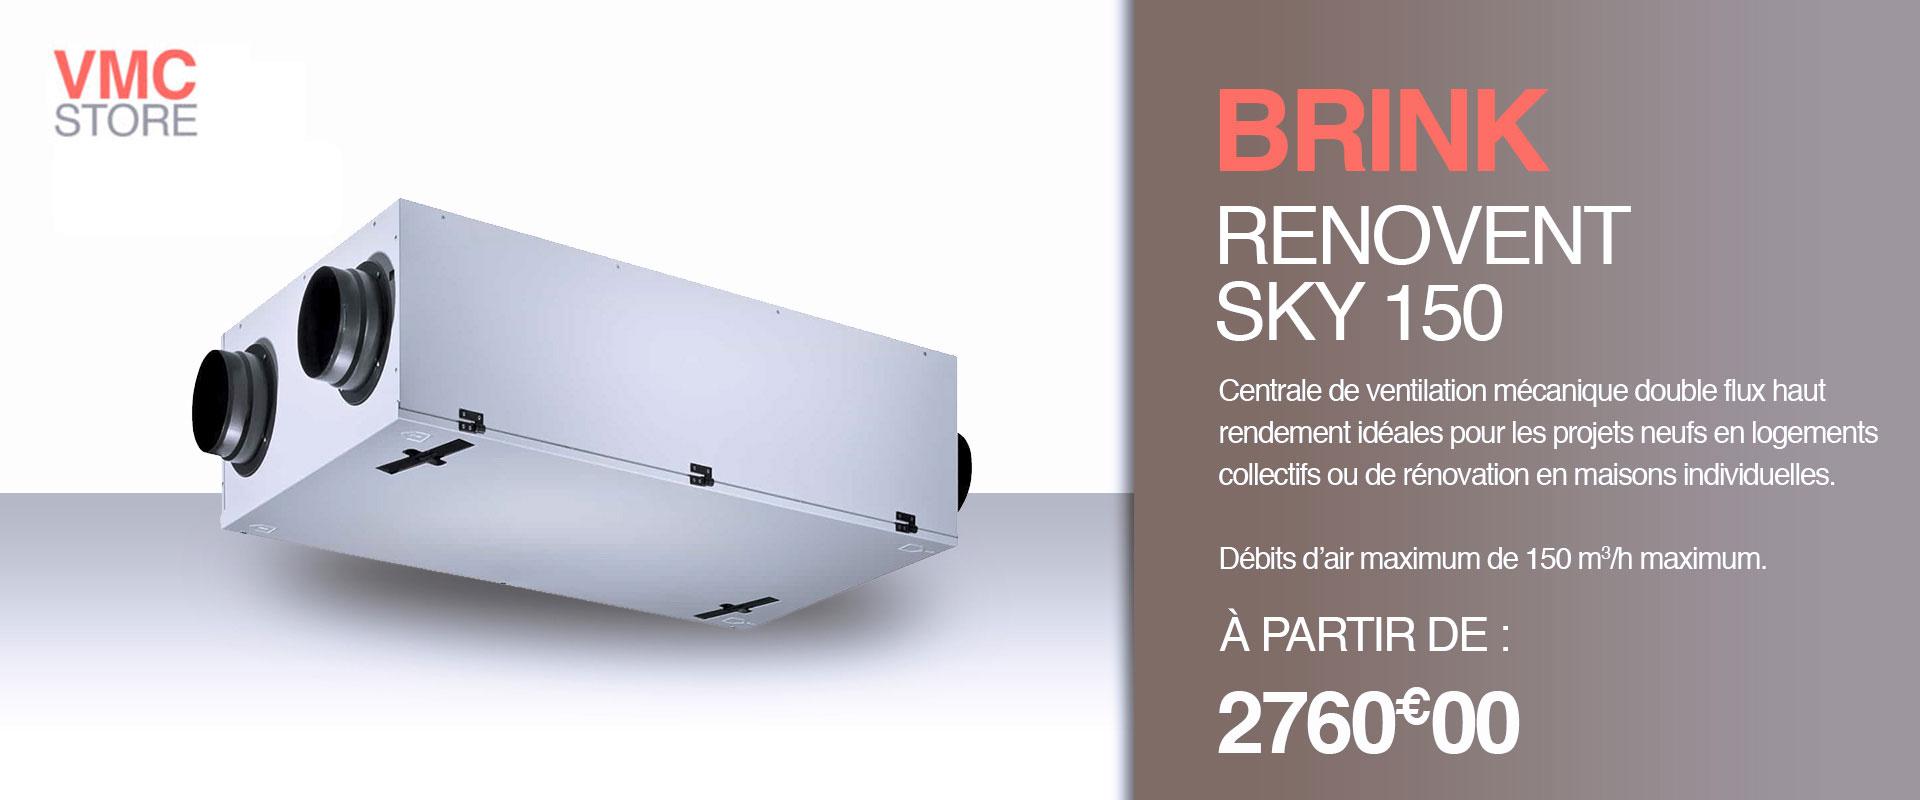 Kit VMC double flux renovent sky 150